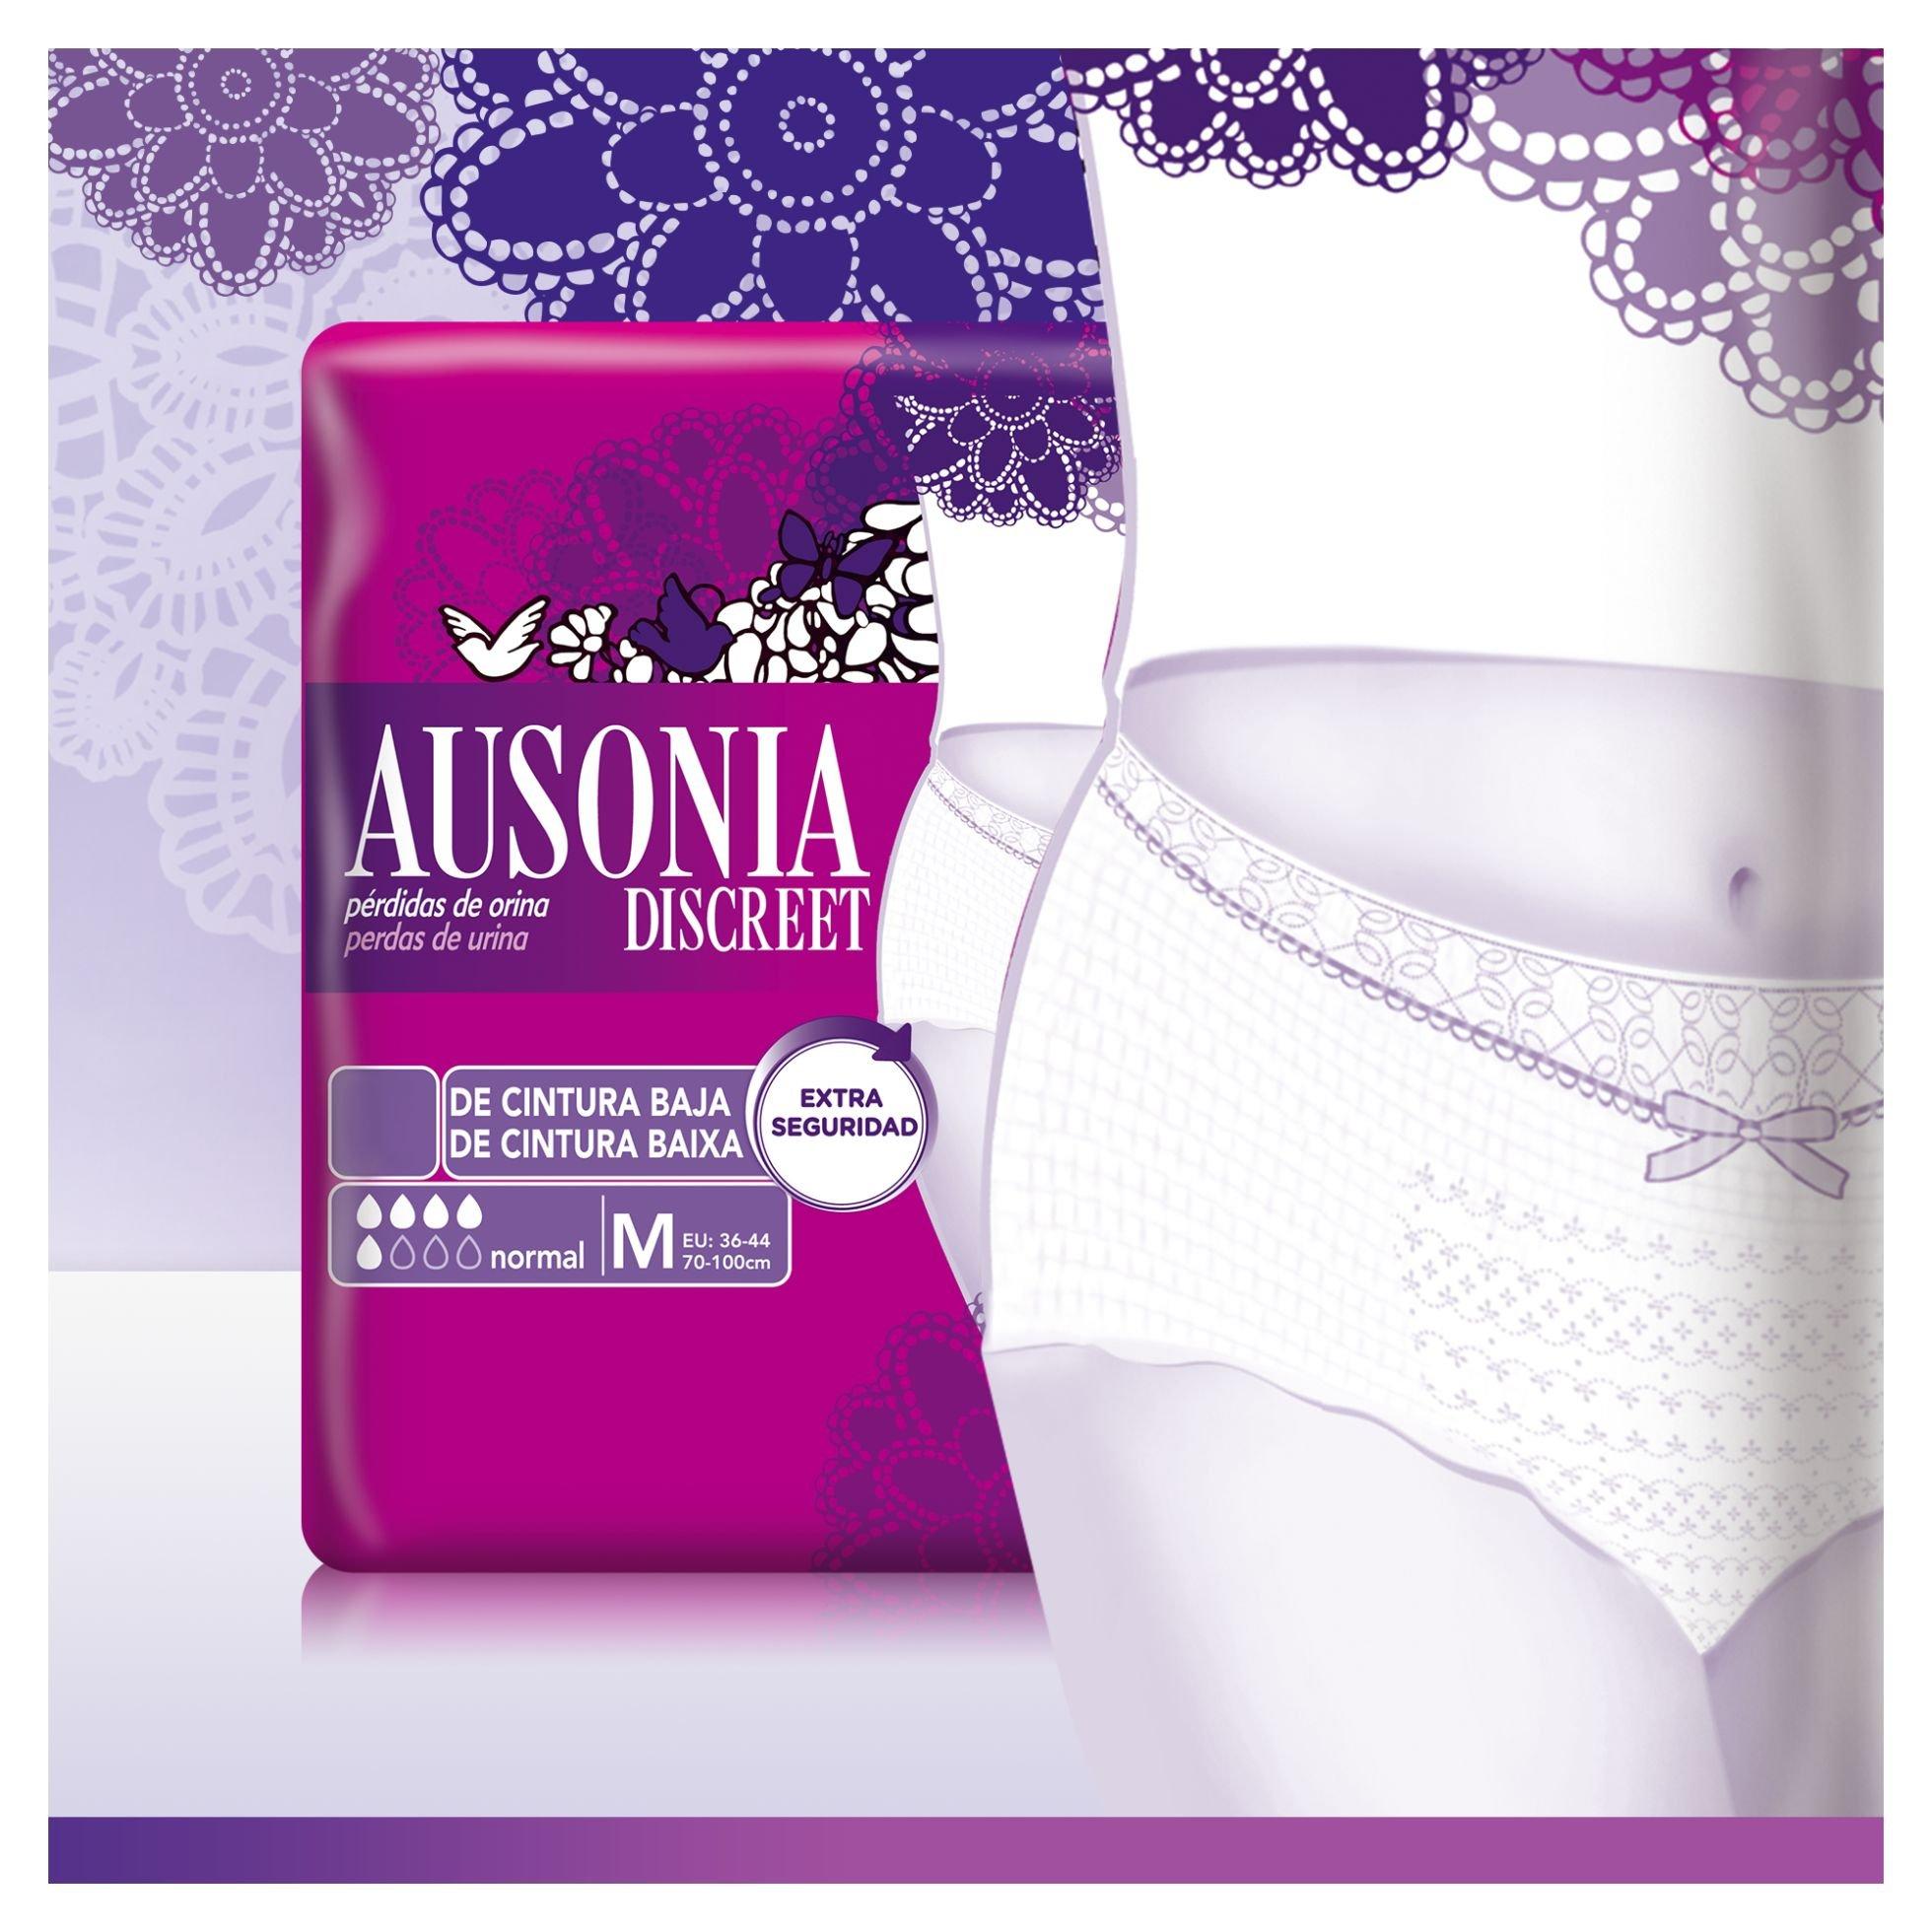 Ausonia Discreet Boutique Mutandine per perdite di urina M nere 18 pezzi 1040 g